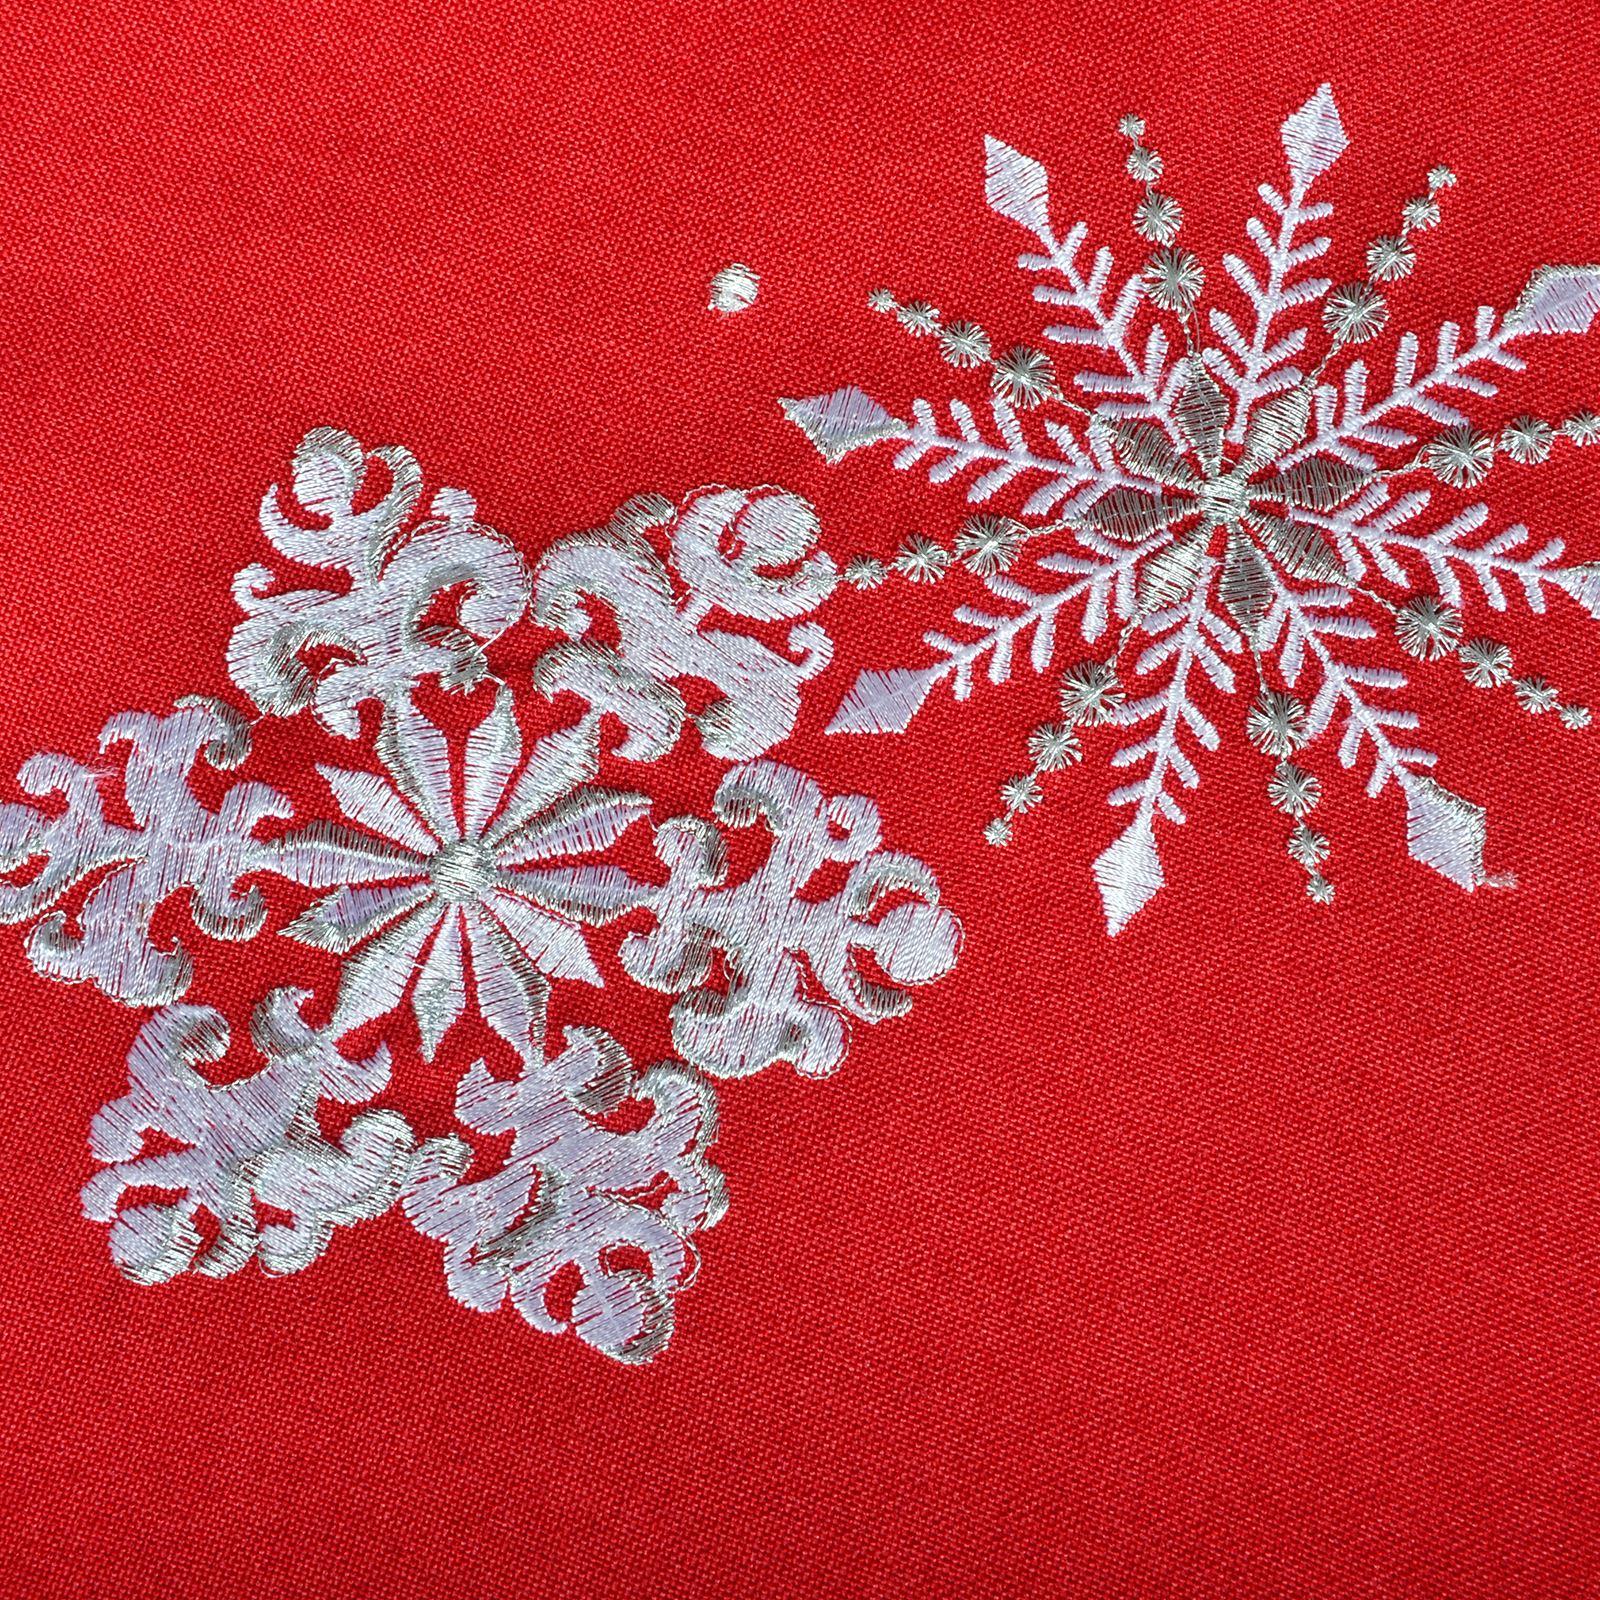 Christmas-Tablecloth-Festive-Pattern-Rectangle-Round-Fabric-Xmas-Room-Decoration Indexbild 38